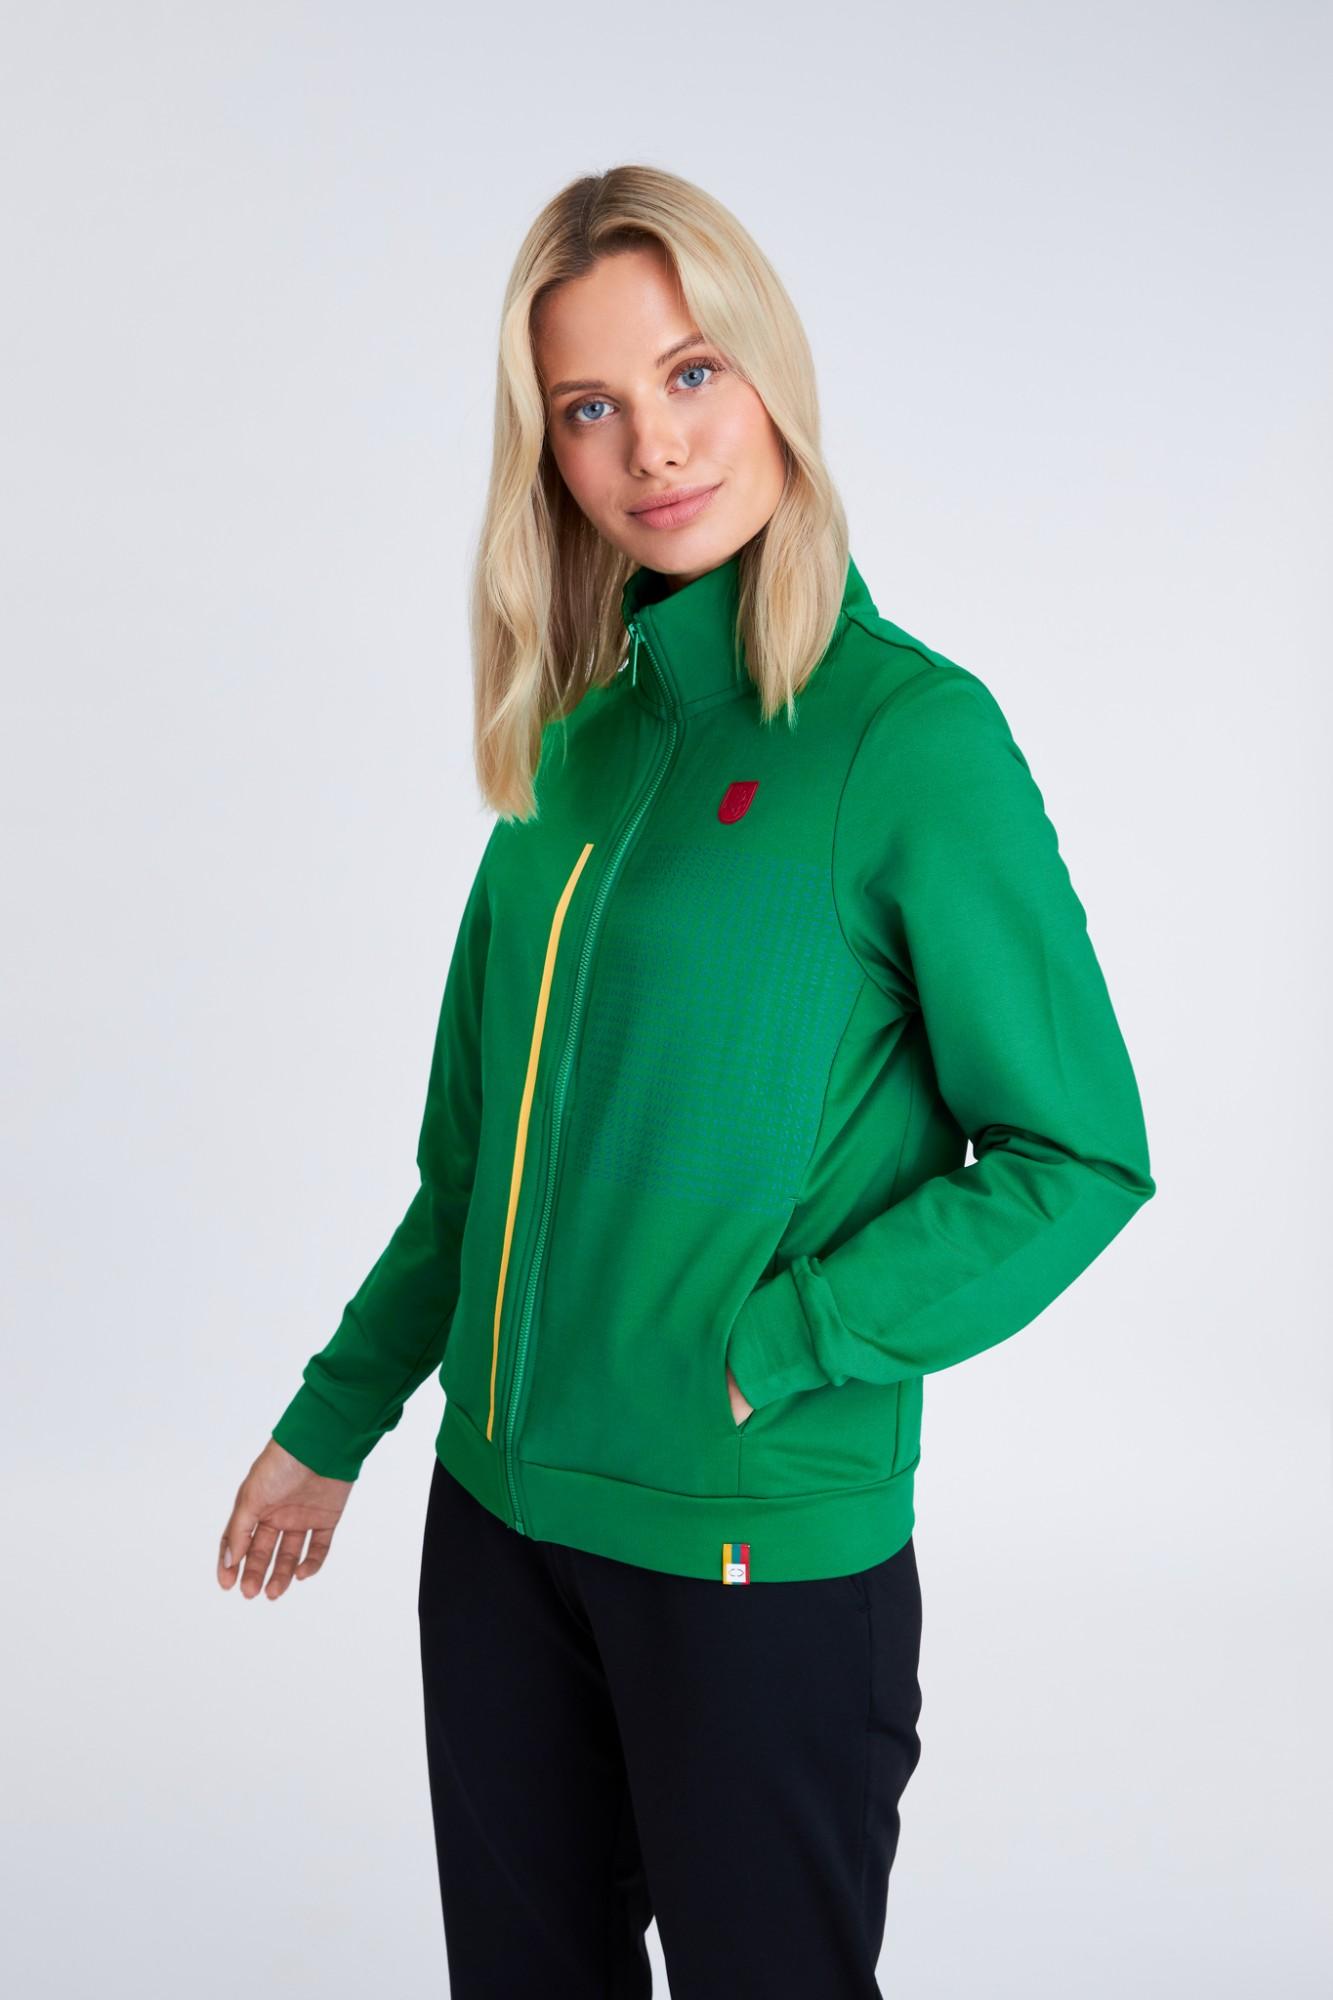 AUDIMAS Ats. džemperis medvilniniu vidumi 21LT-006 Jolly Green 406 XXL